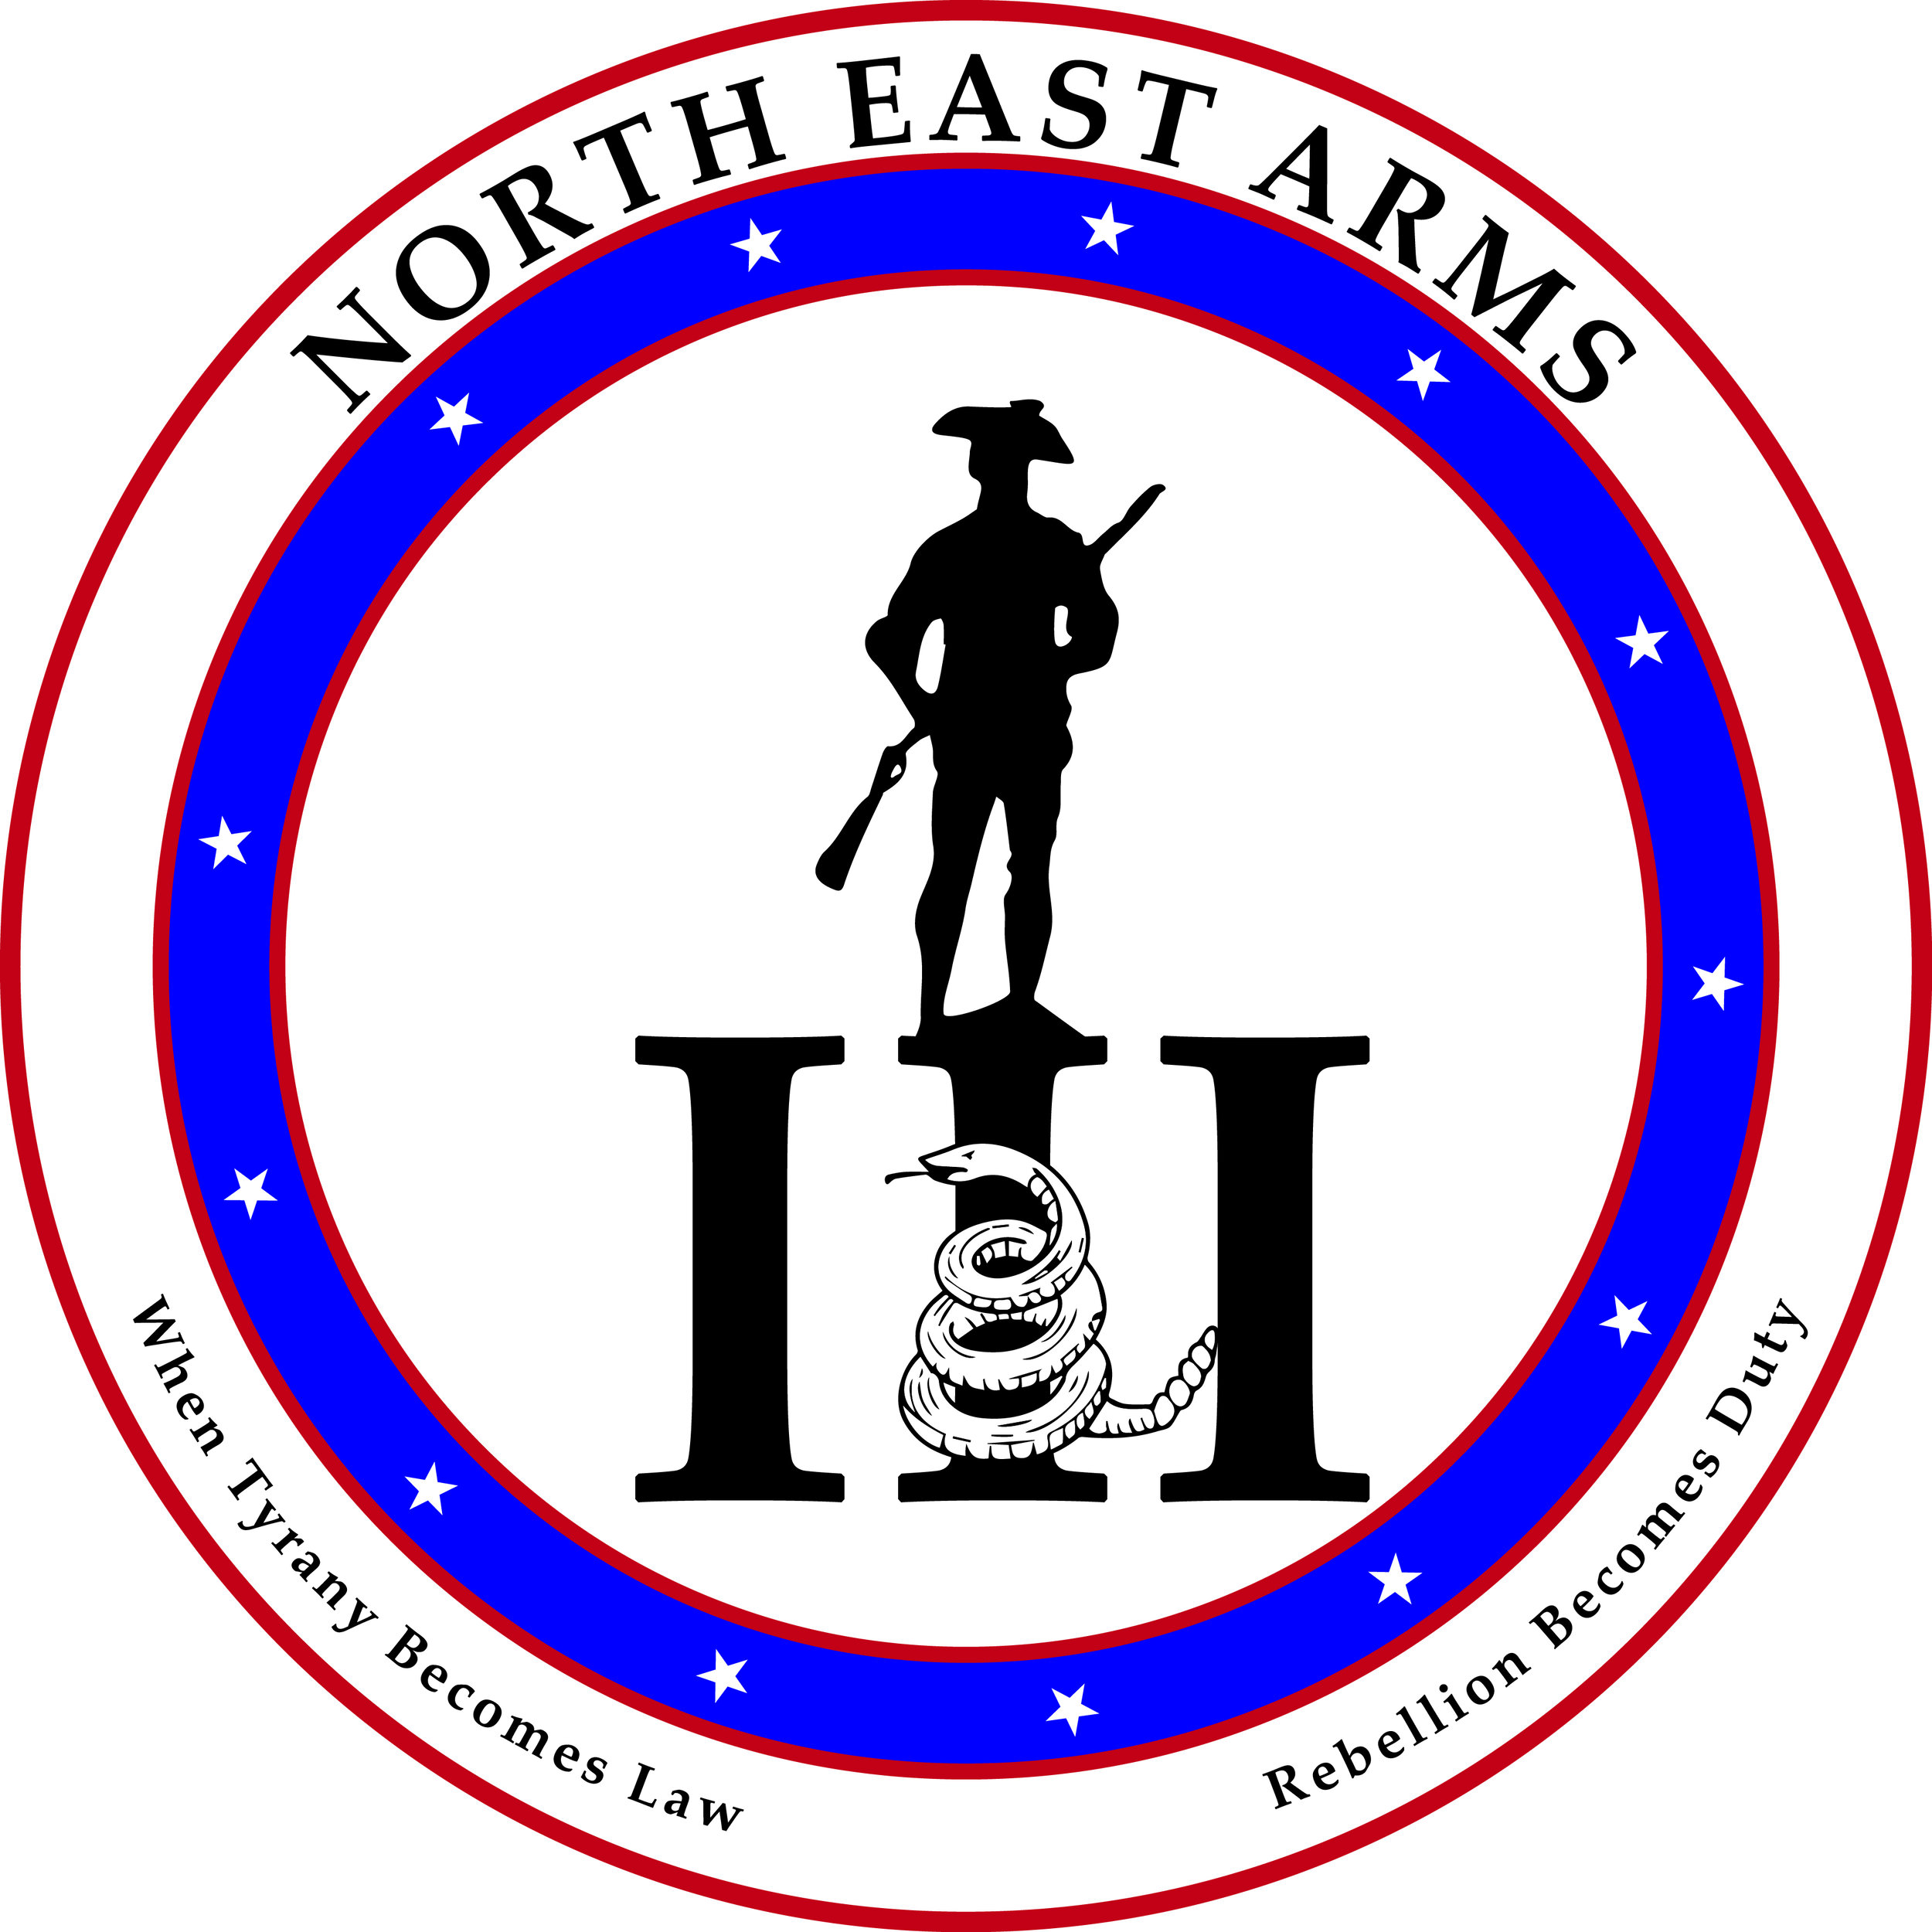 North East Arms Logo v4.jpg